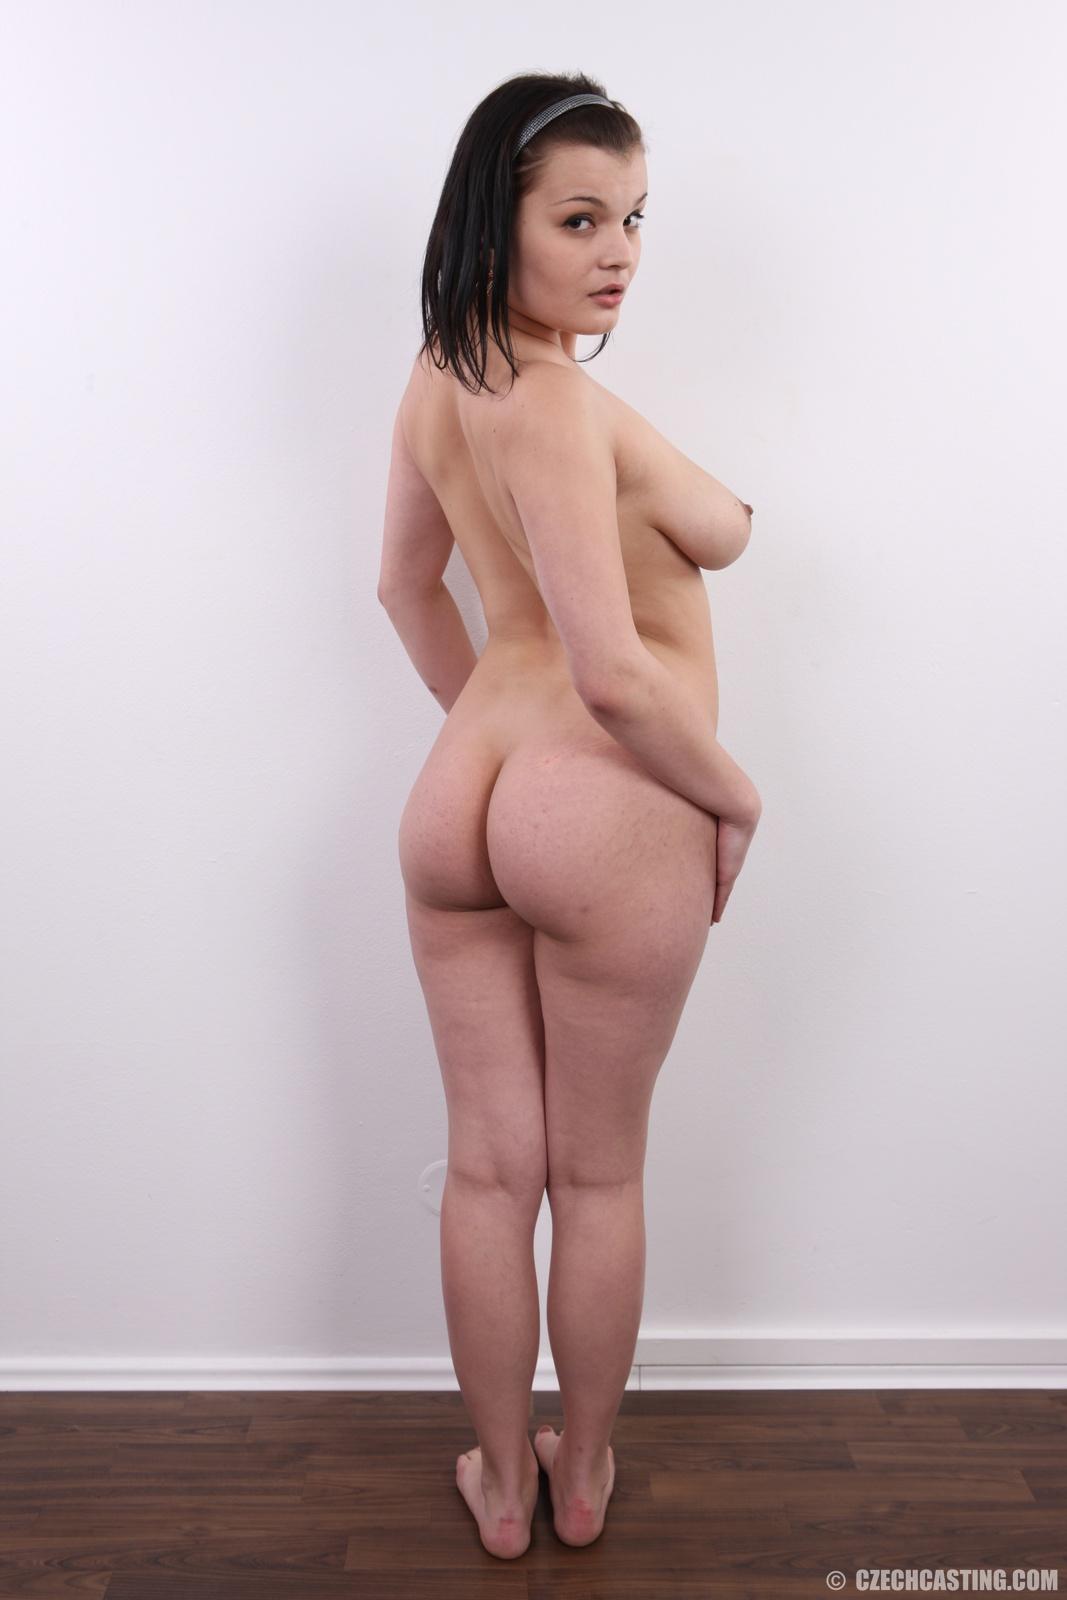 sex seznamka ostrava czech casting nikola